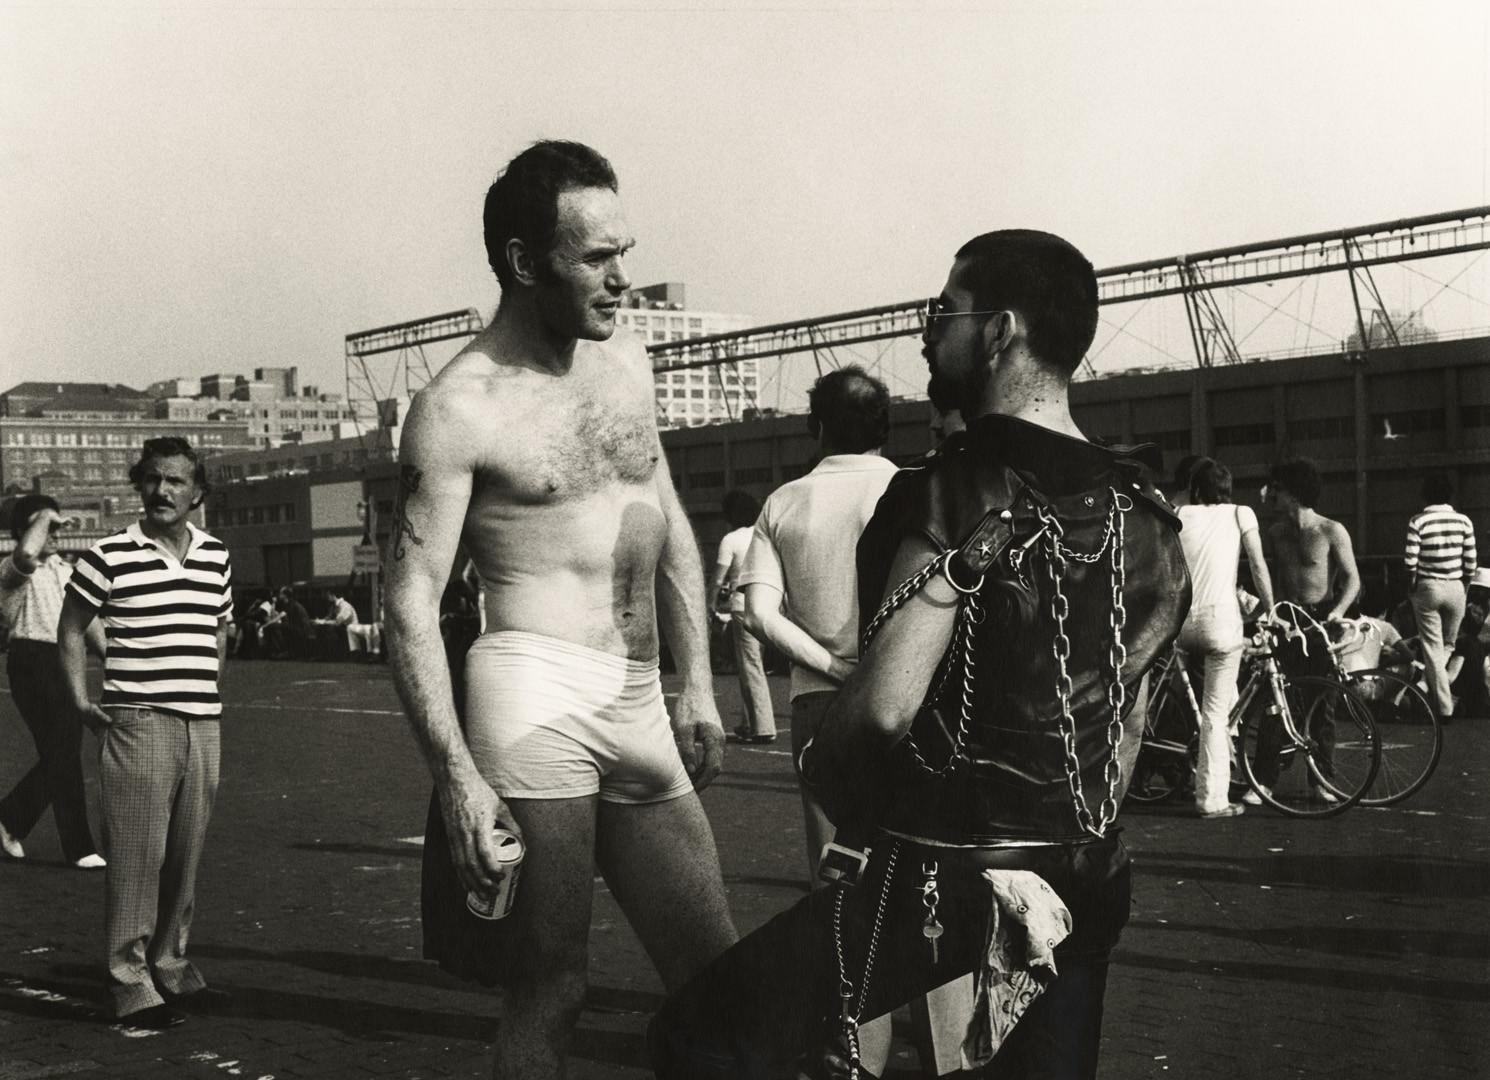 Peter Hujar, Men on Christopher Street Pier, 1976